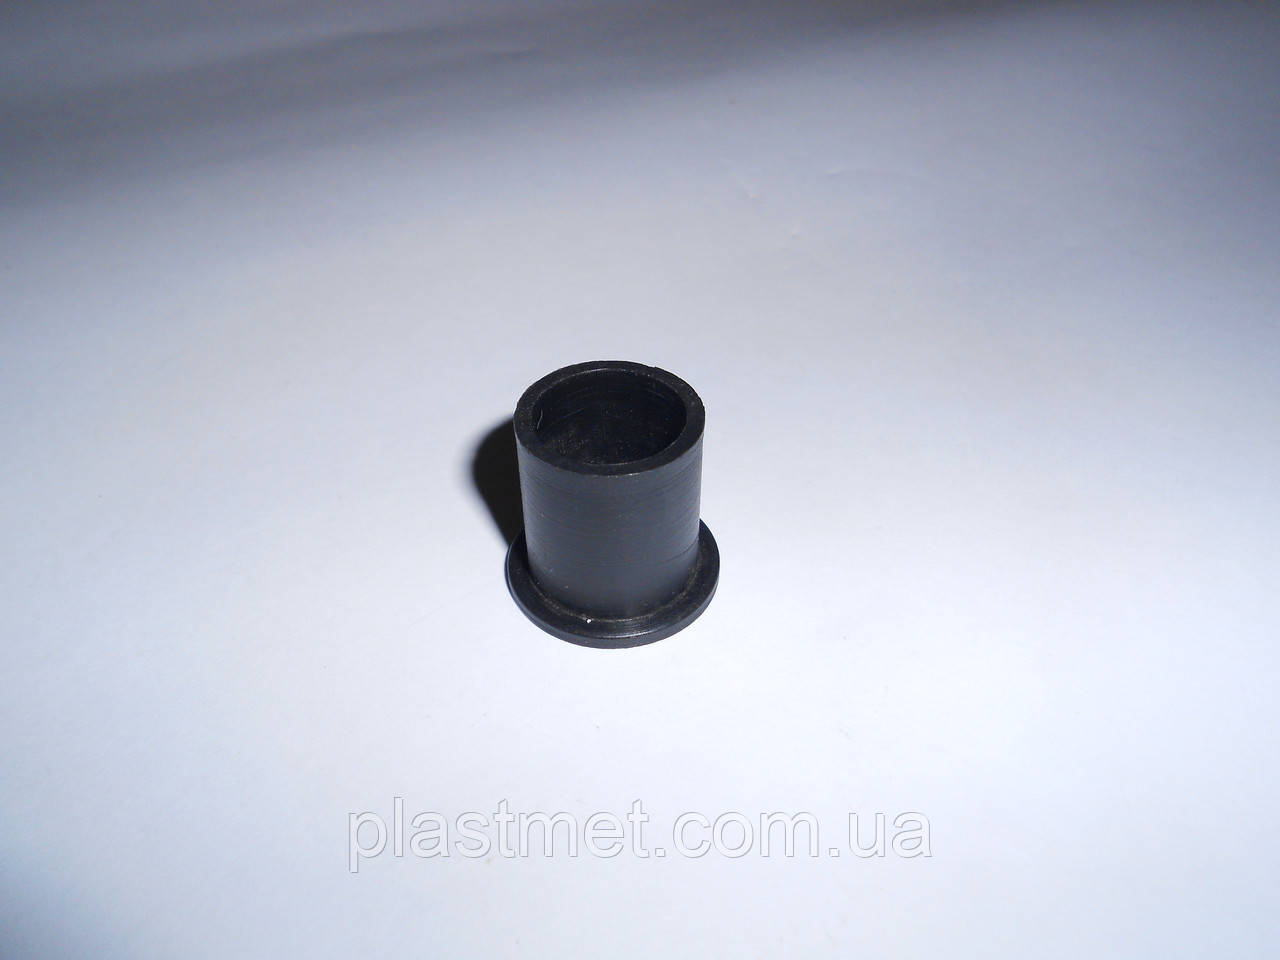 Втулка 10 мм